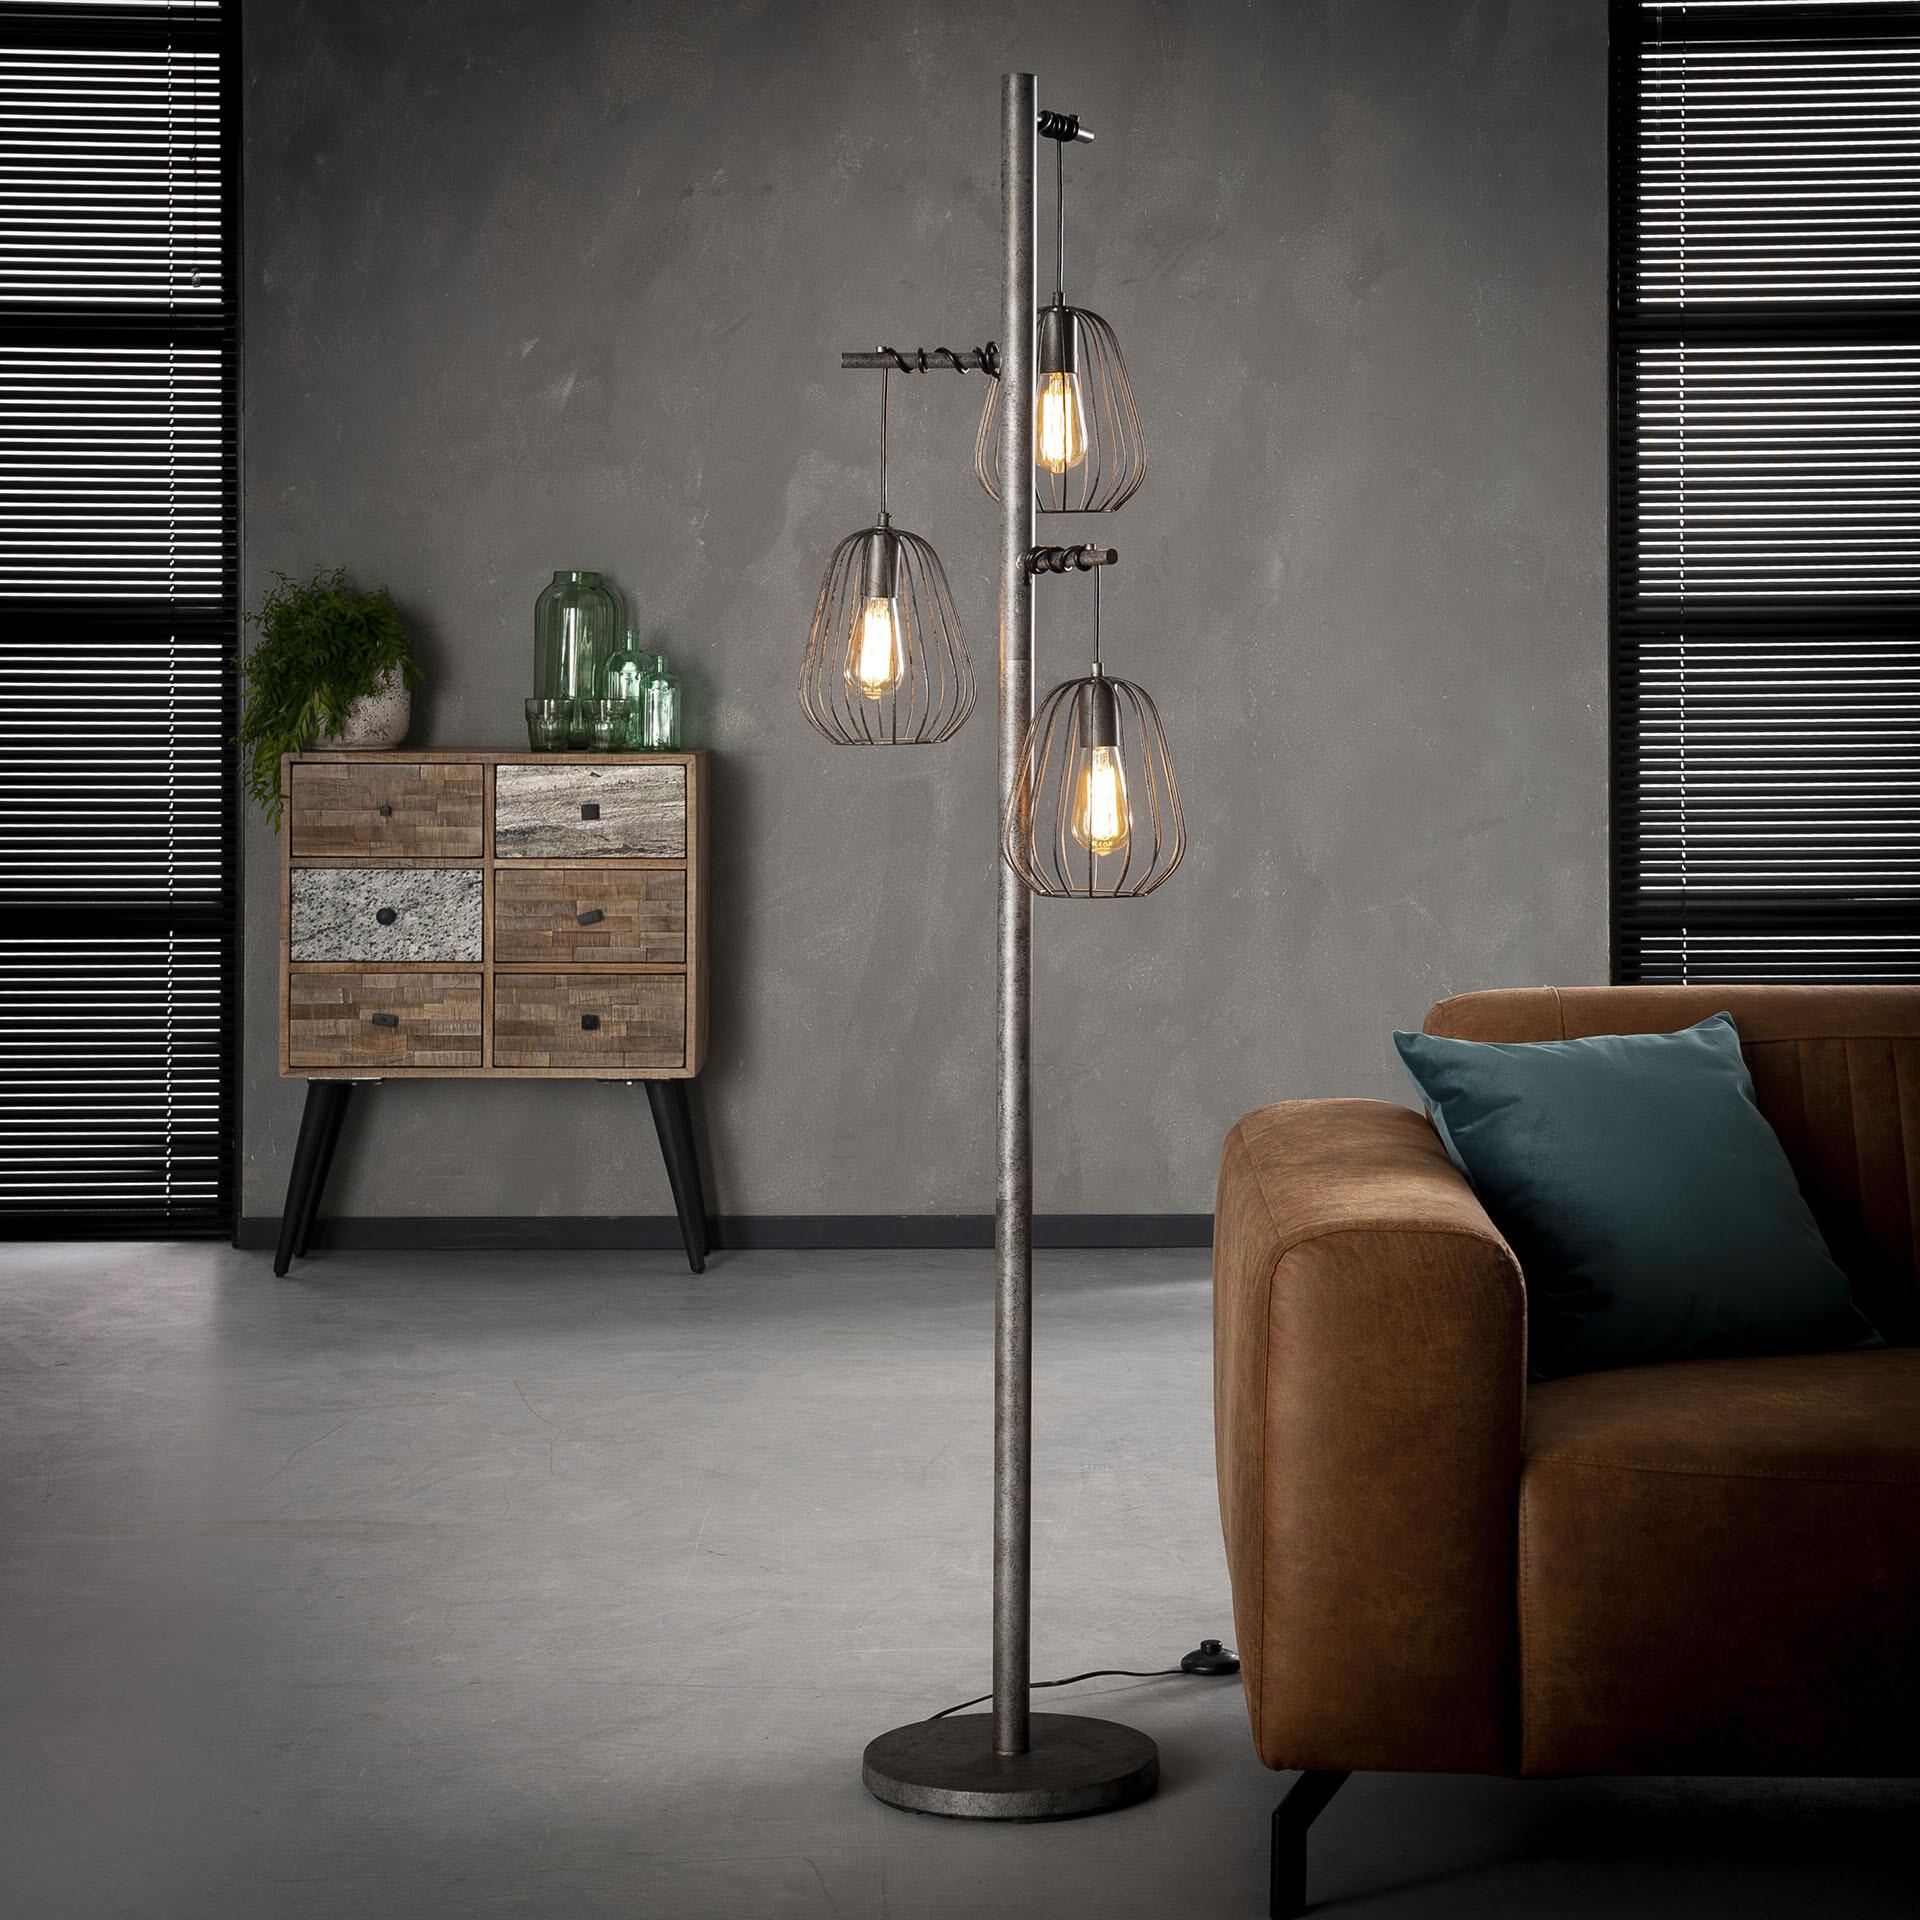 Vloerlamp 'Rupert' 3-lamps lampion, oud zilver